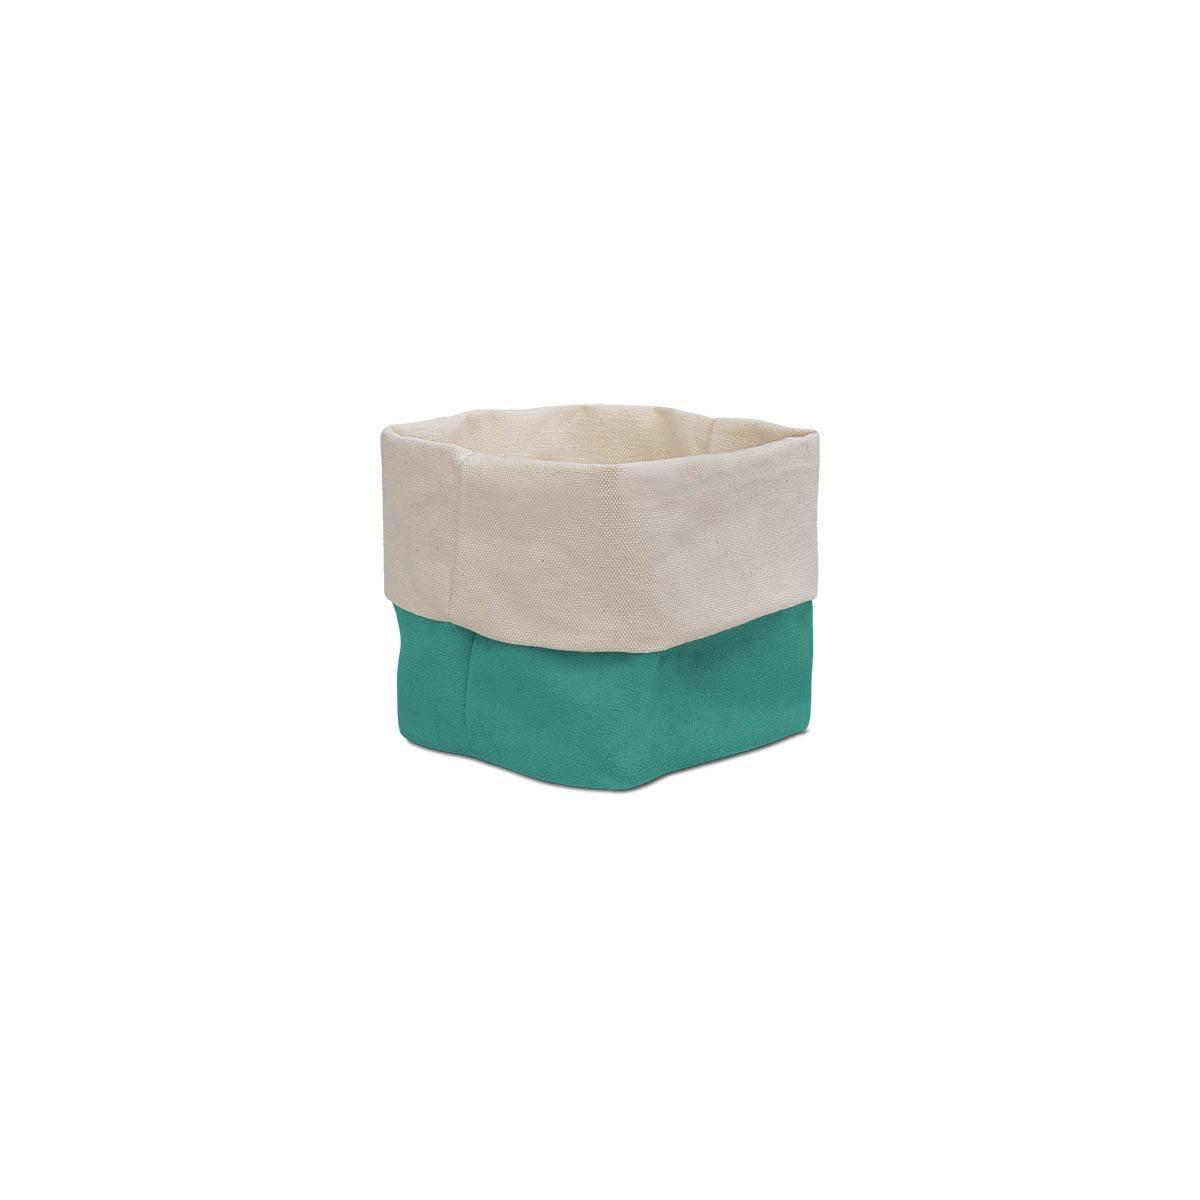 Porta Treco • Futon Company ® #245B52 1200x1200 Acessorios Banheiro Moema